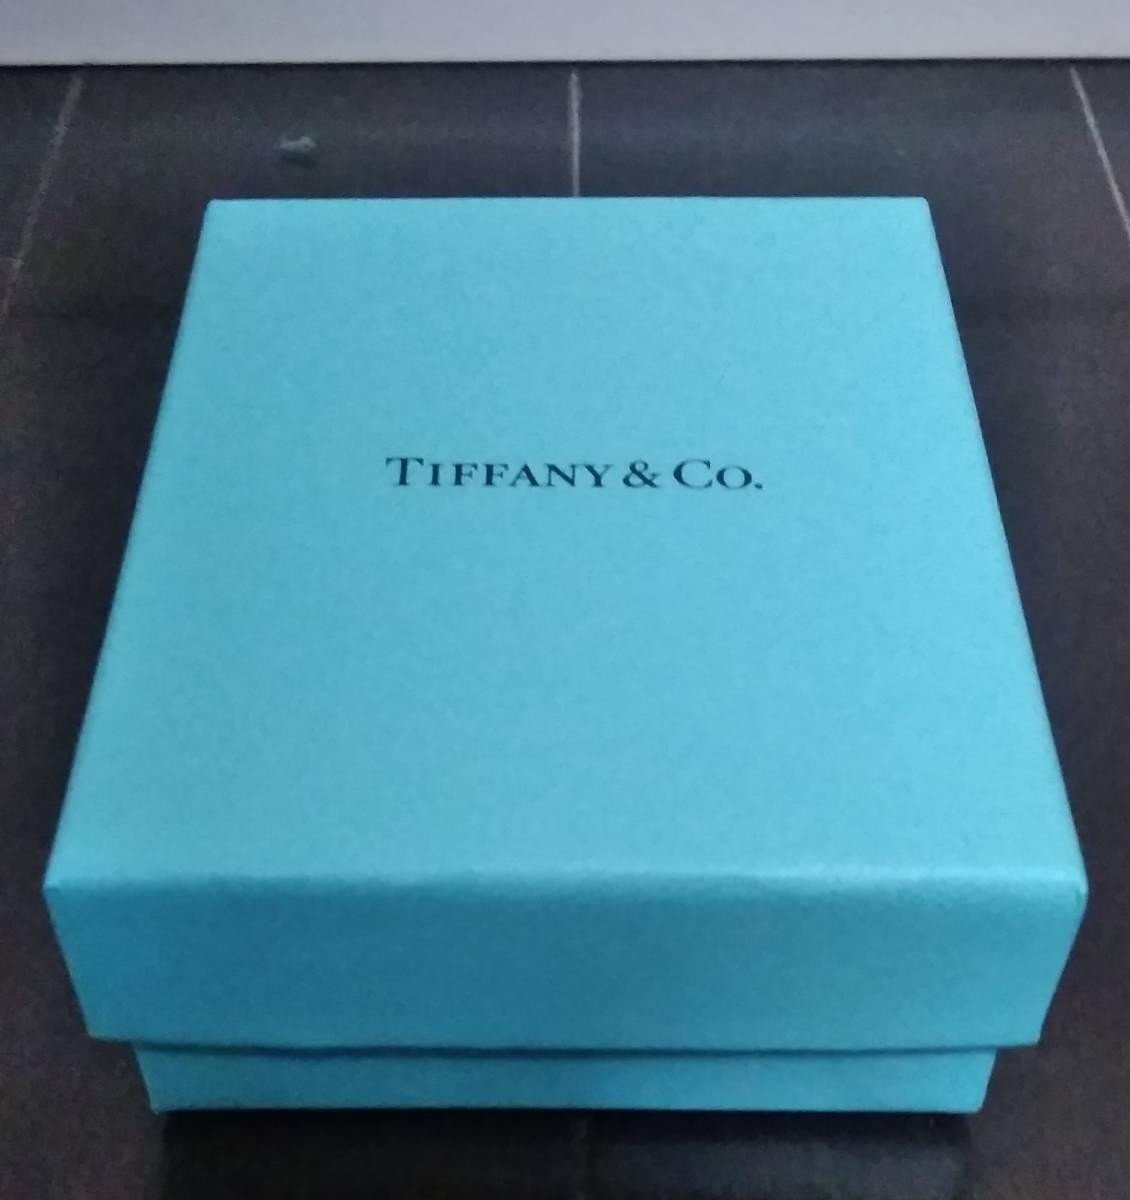 TIFFANY&CO.ティファニー アクセサリー空箱リボンセット